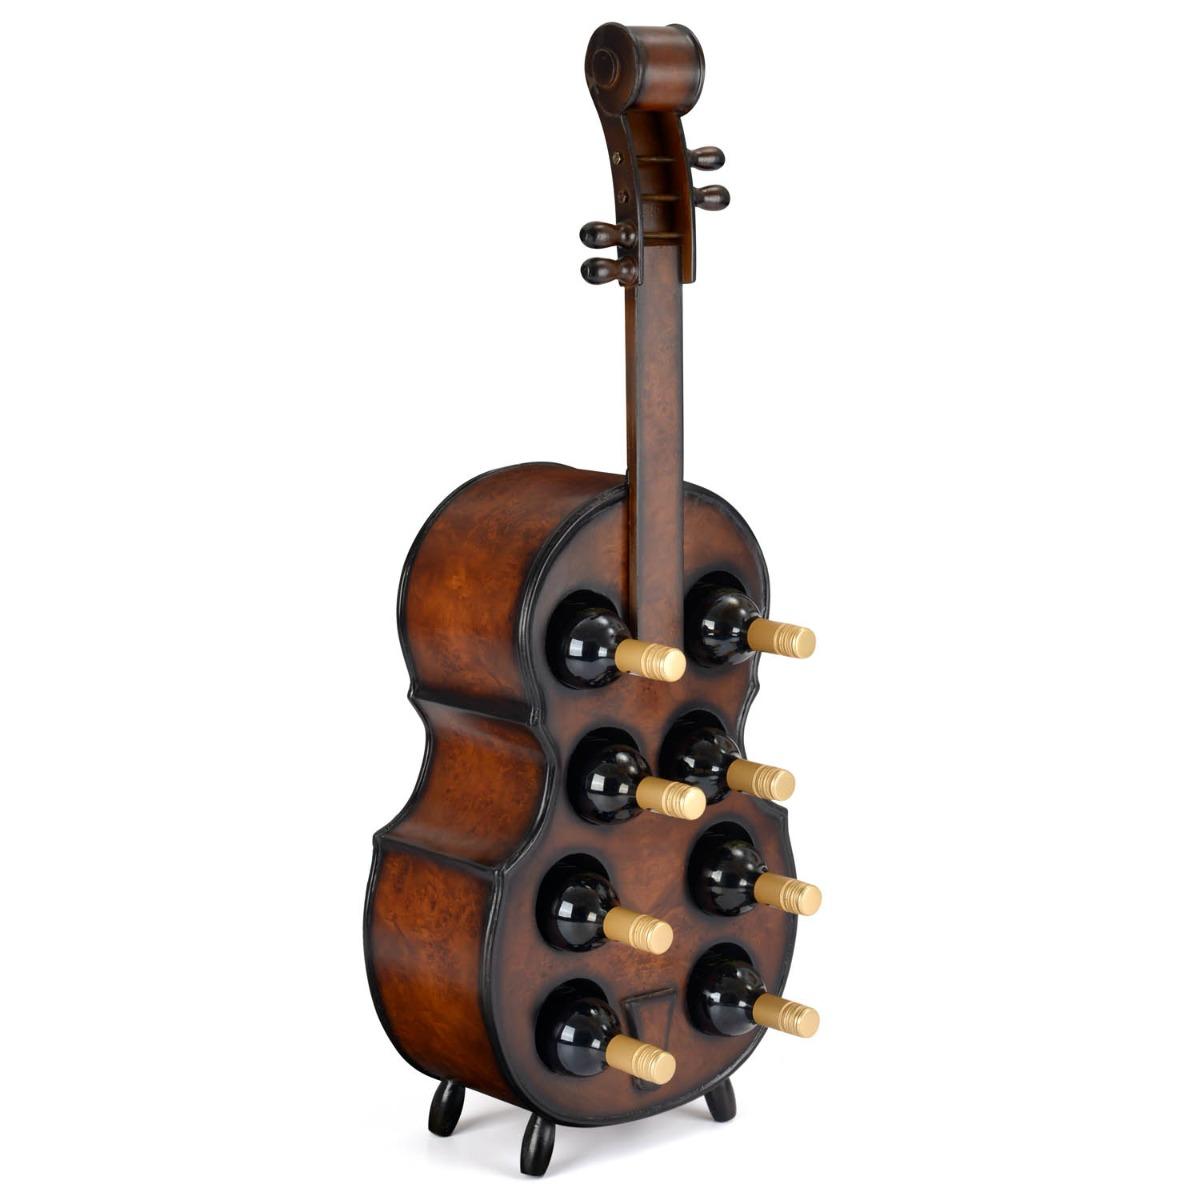 Image of 8 Bottle Wooden Cello Wine Rack